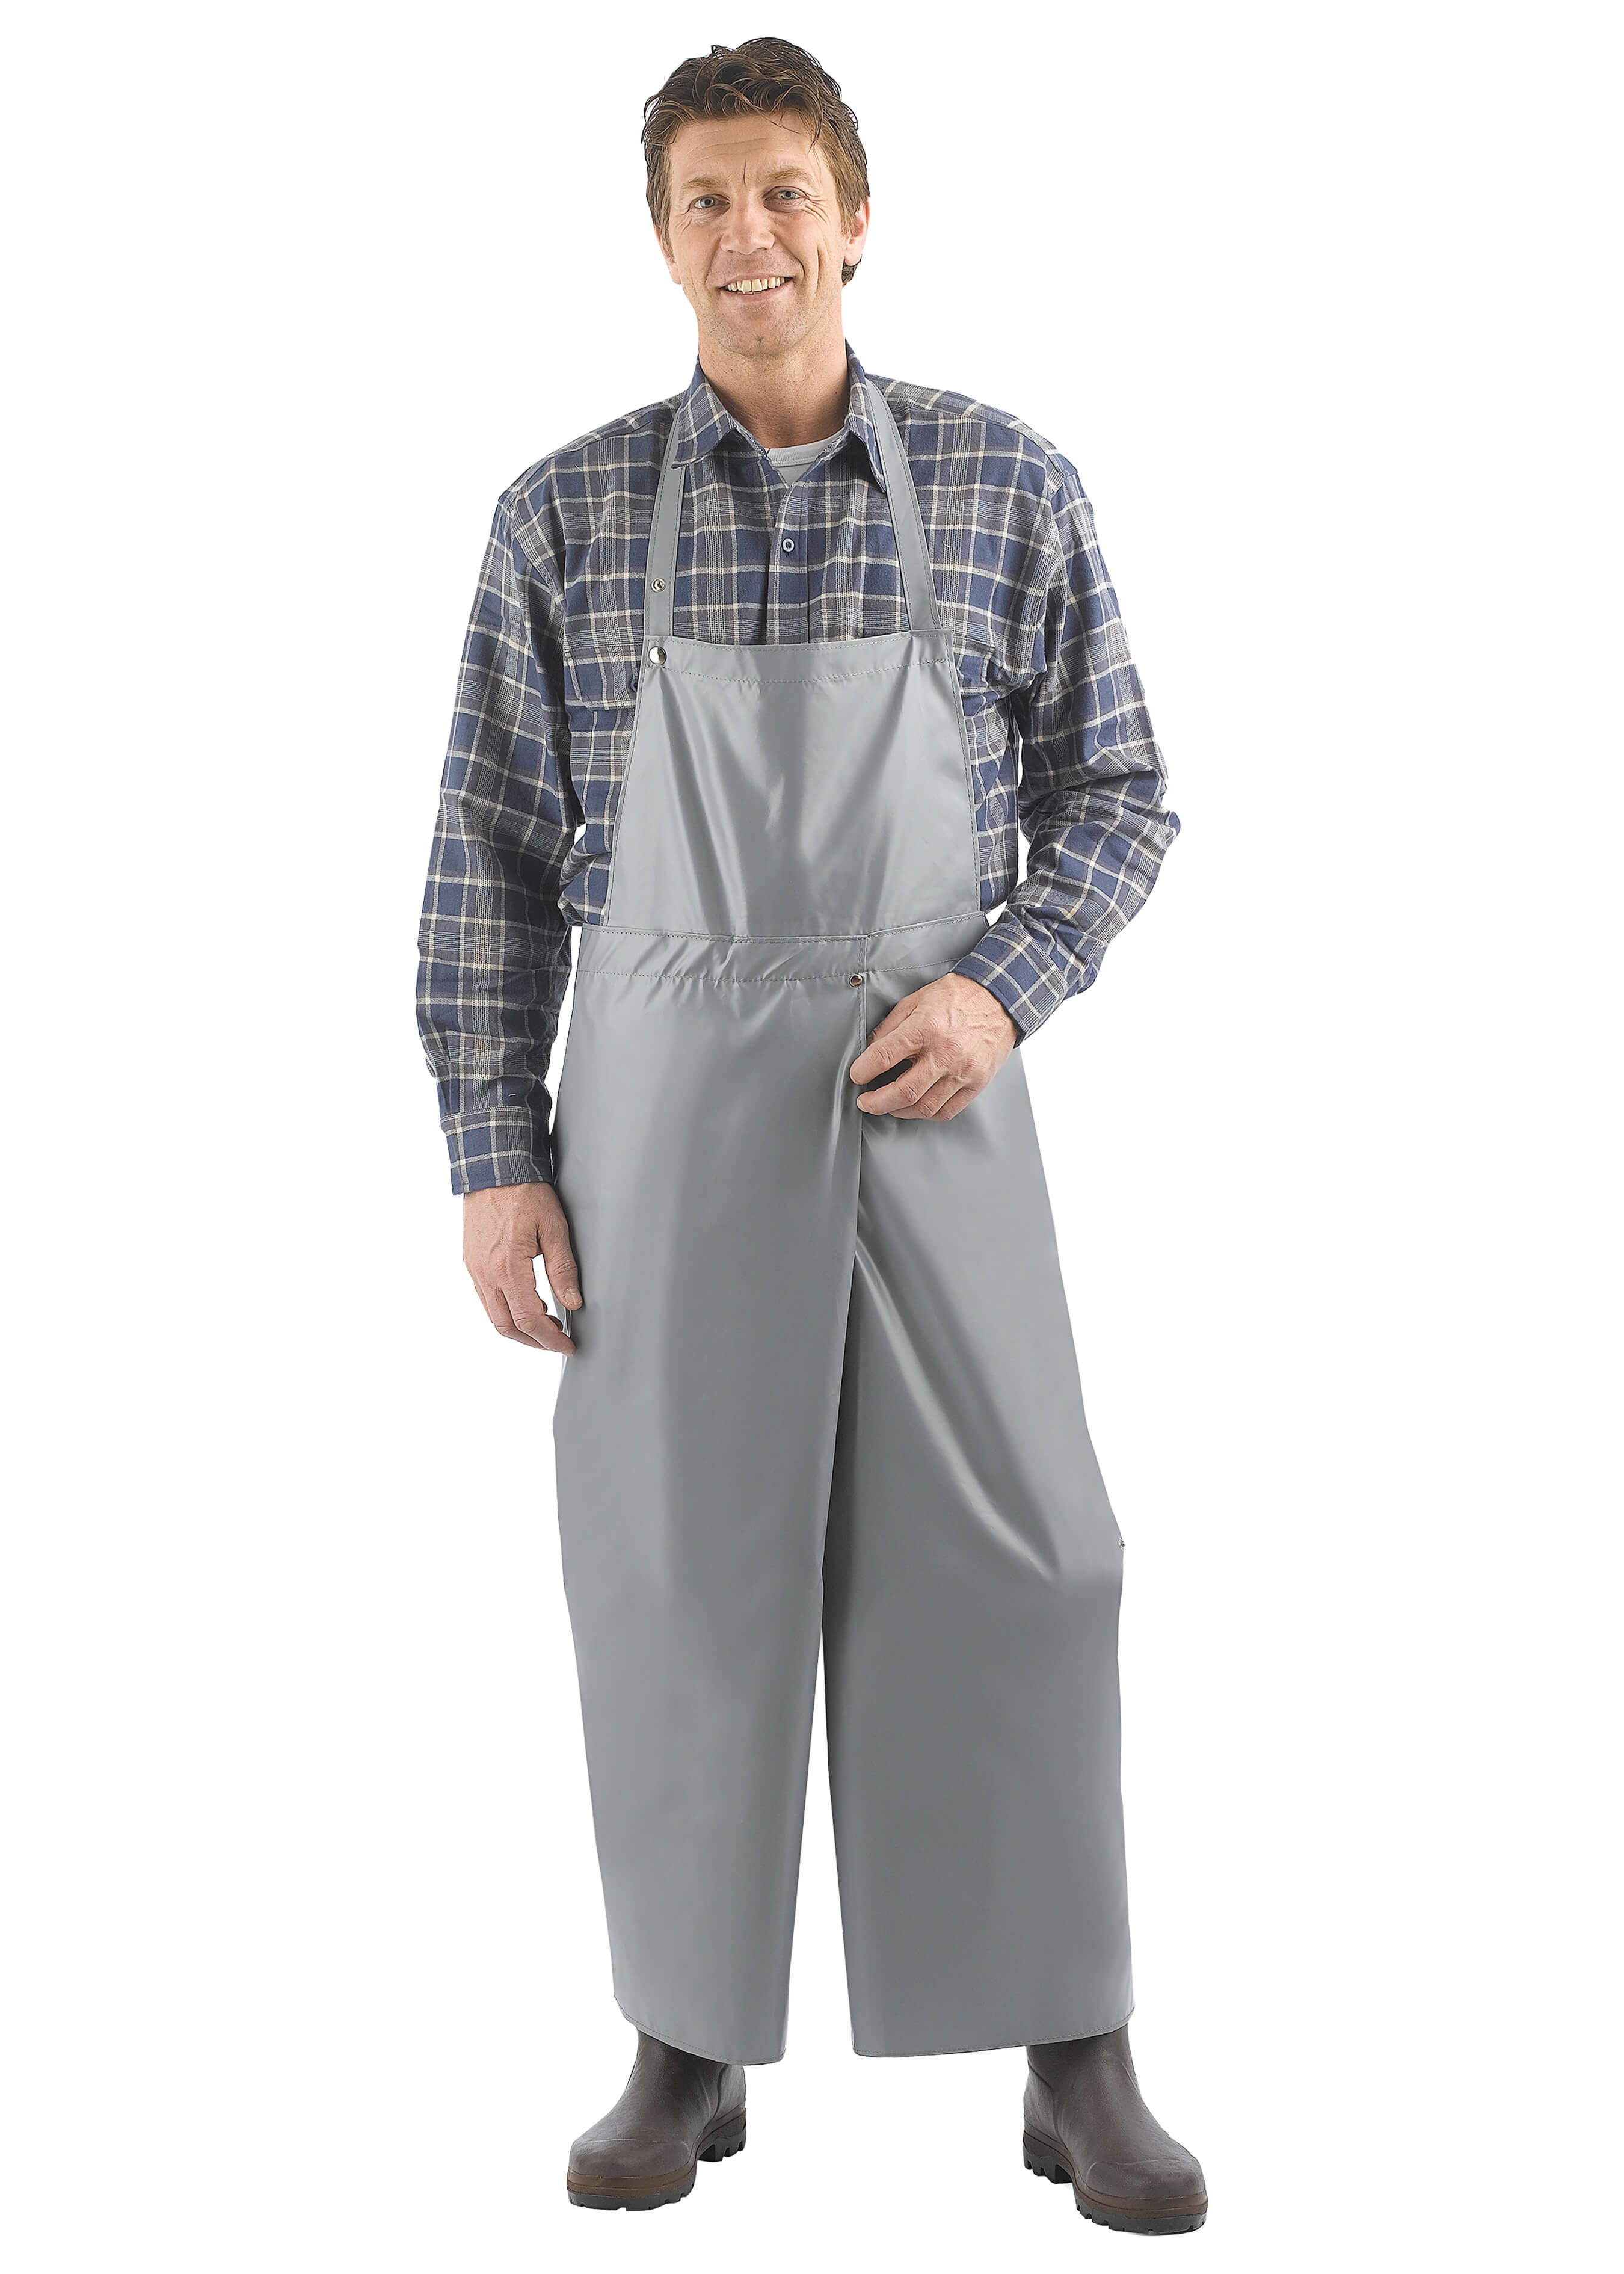 Tablier-pantalon en Trevira L11501110 1